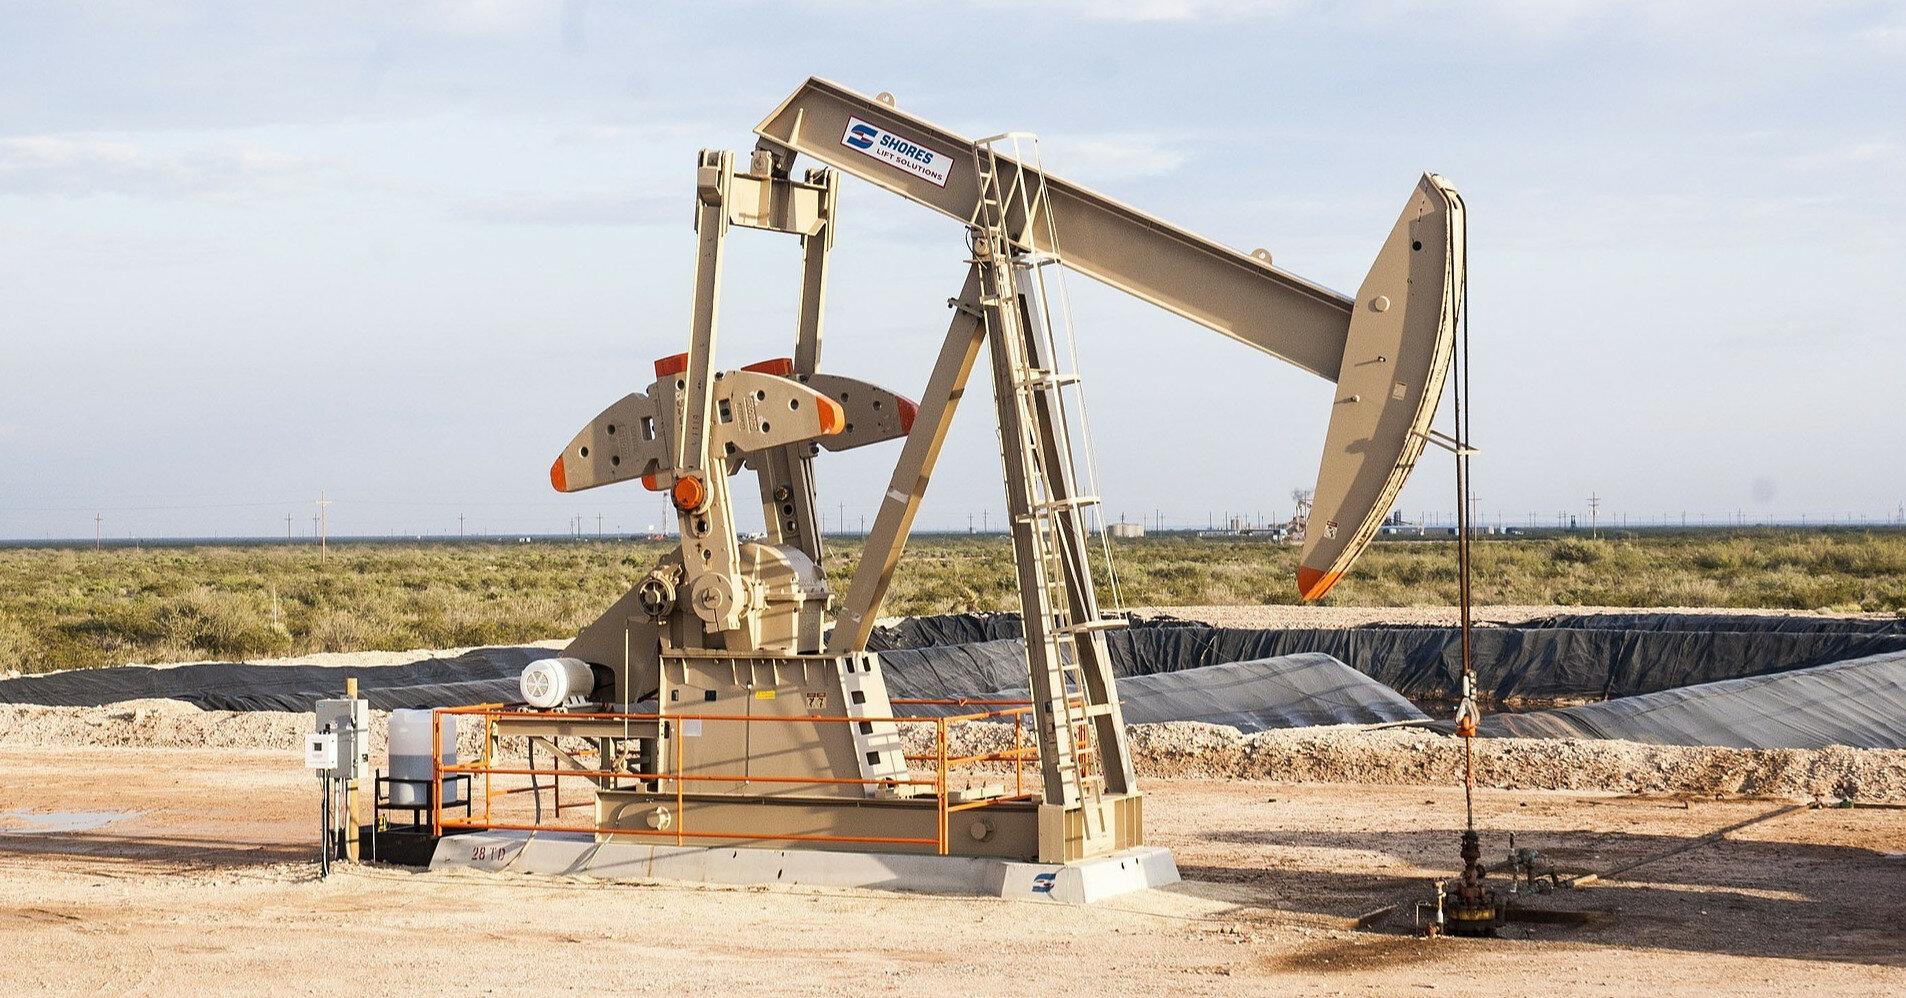 ОПЕК+ увеличит добычу нефти с августа